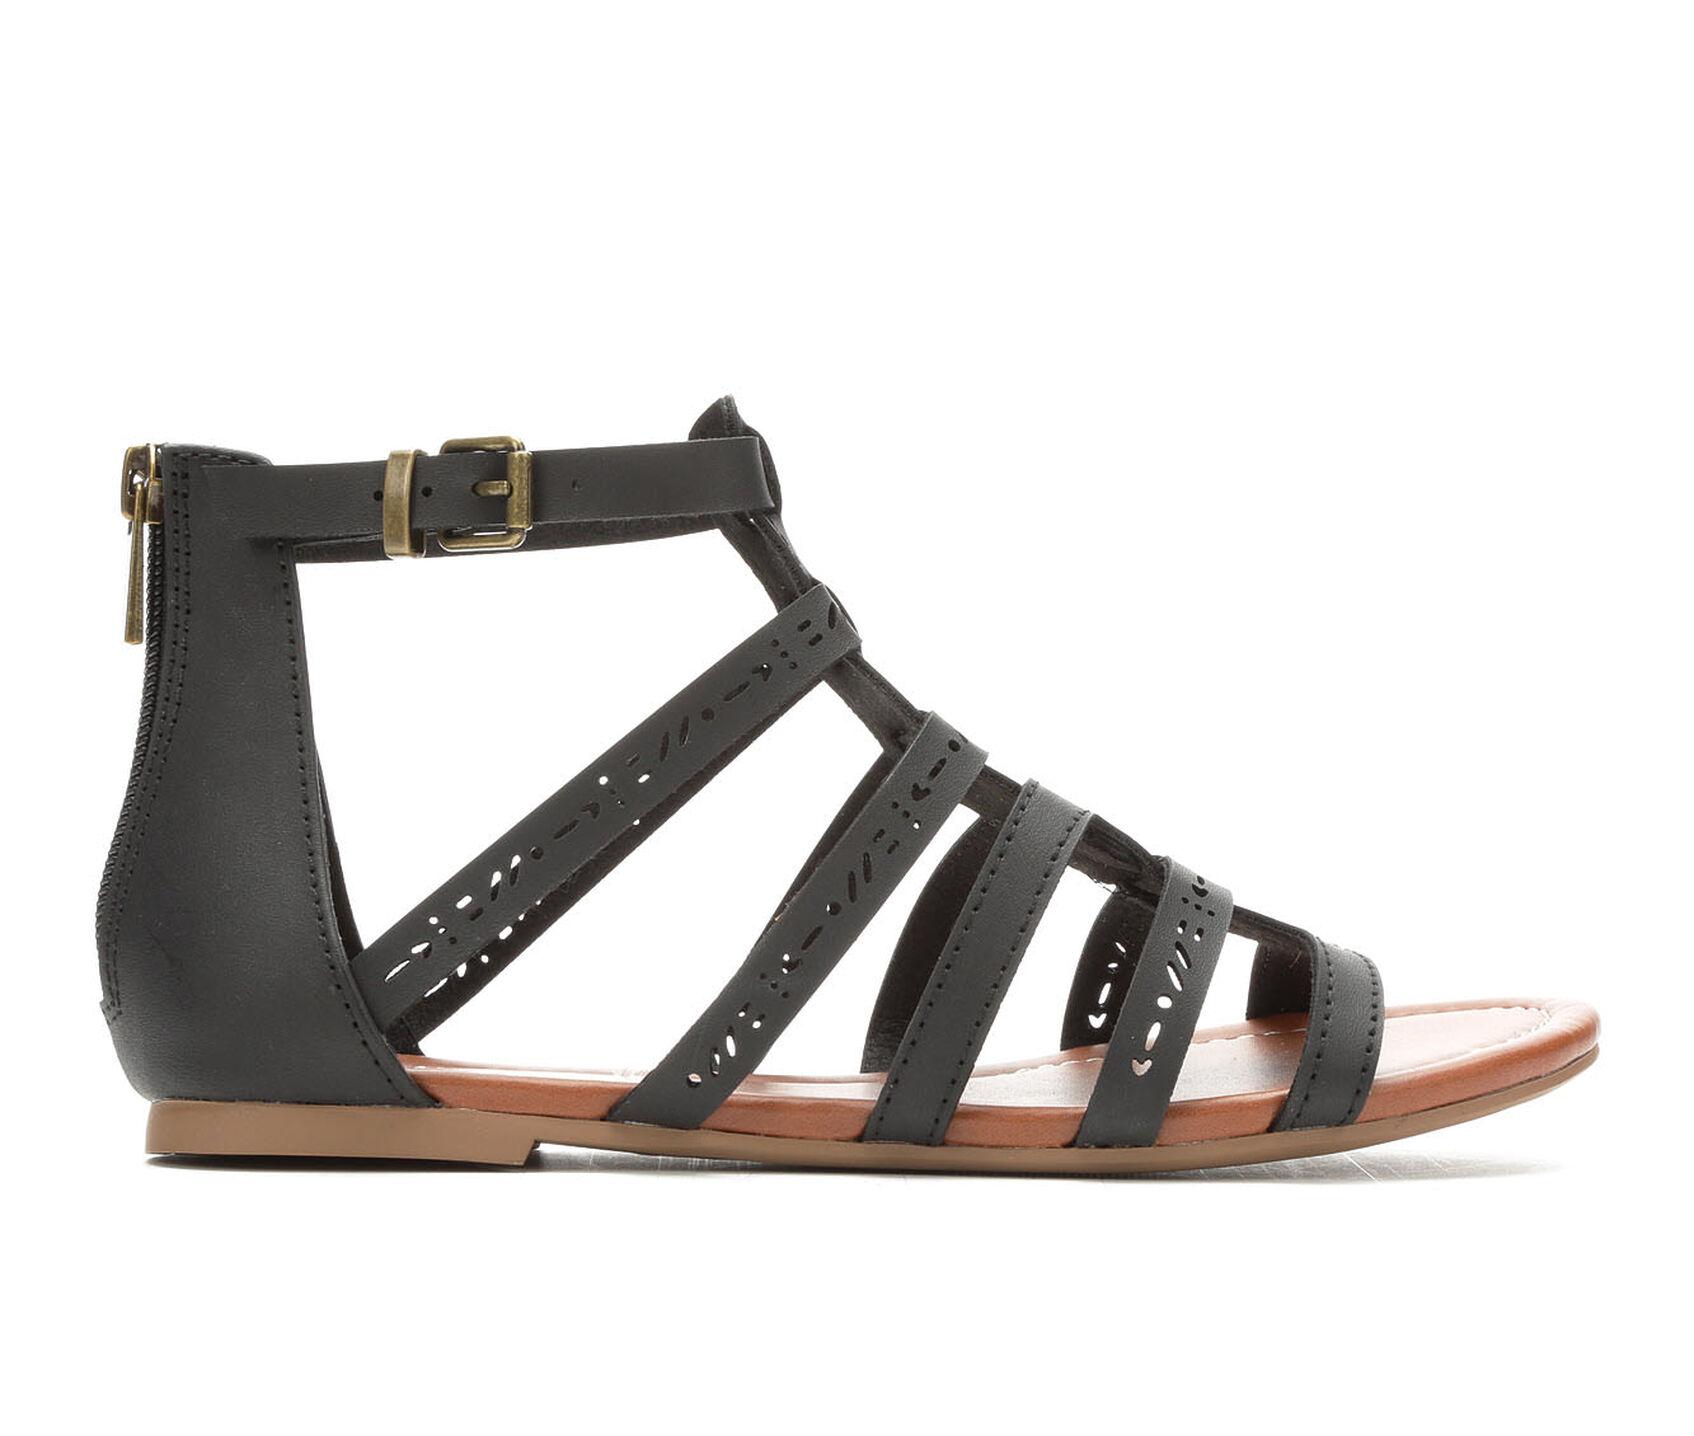 9a718fe4d7 Women's Unr8ed Scarlet Gladiator Sandals